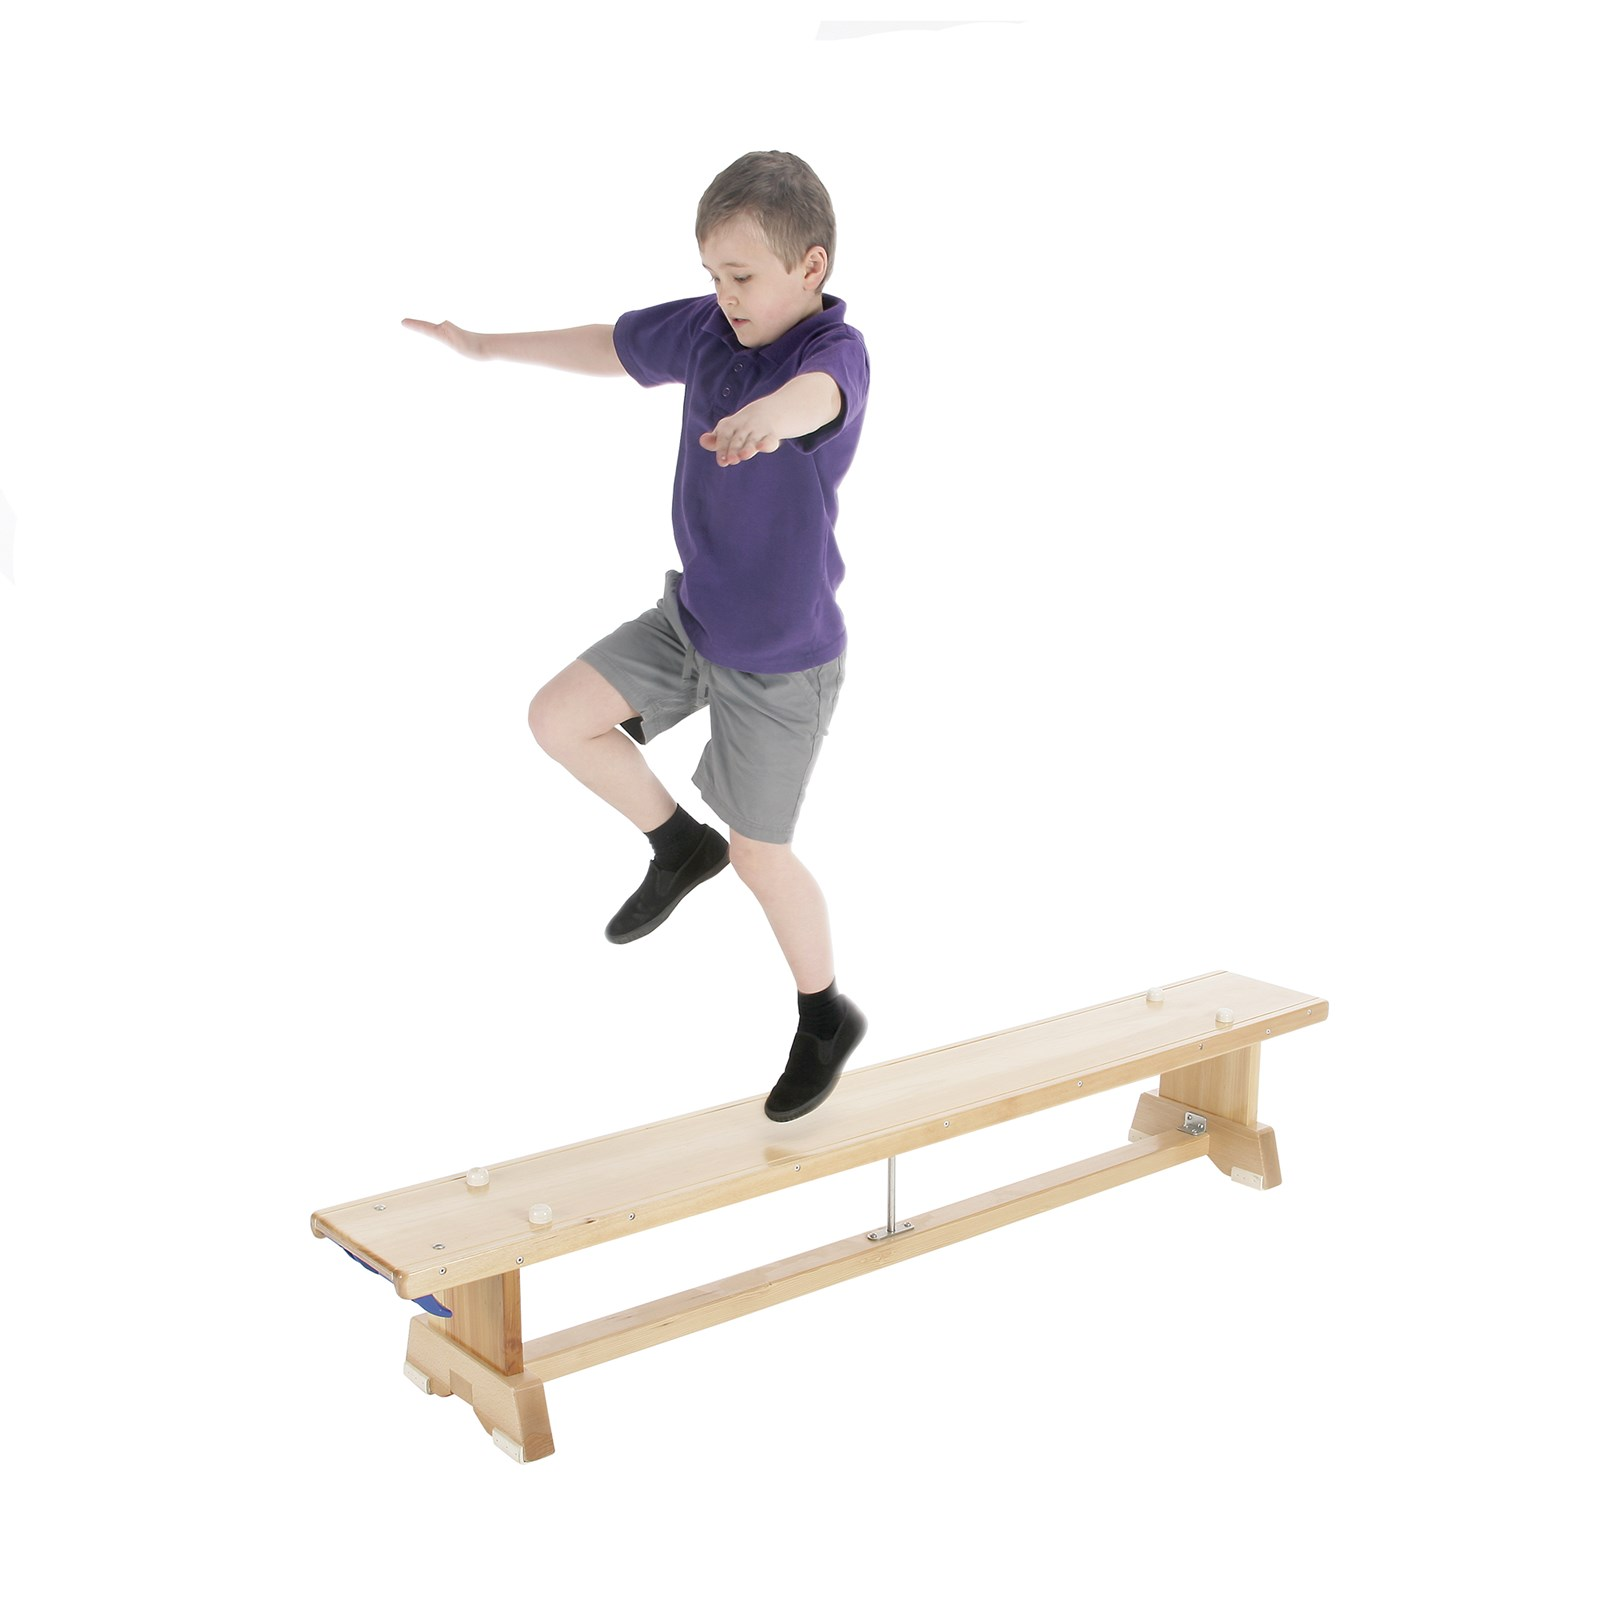 Balance Bench - 1.83m - Hooks One End